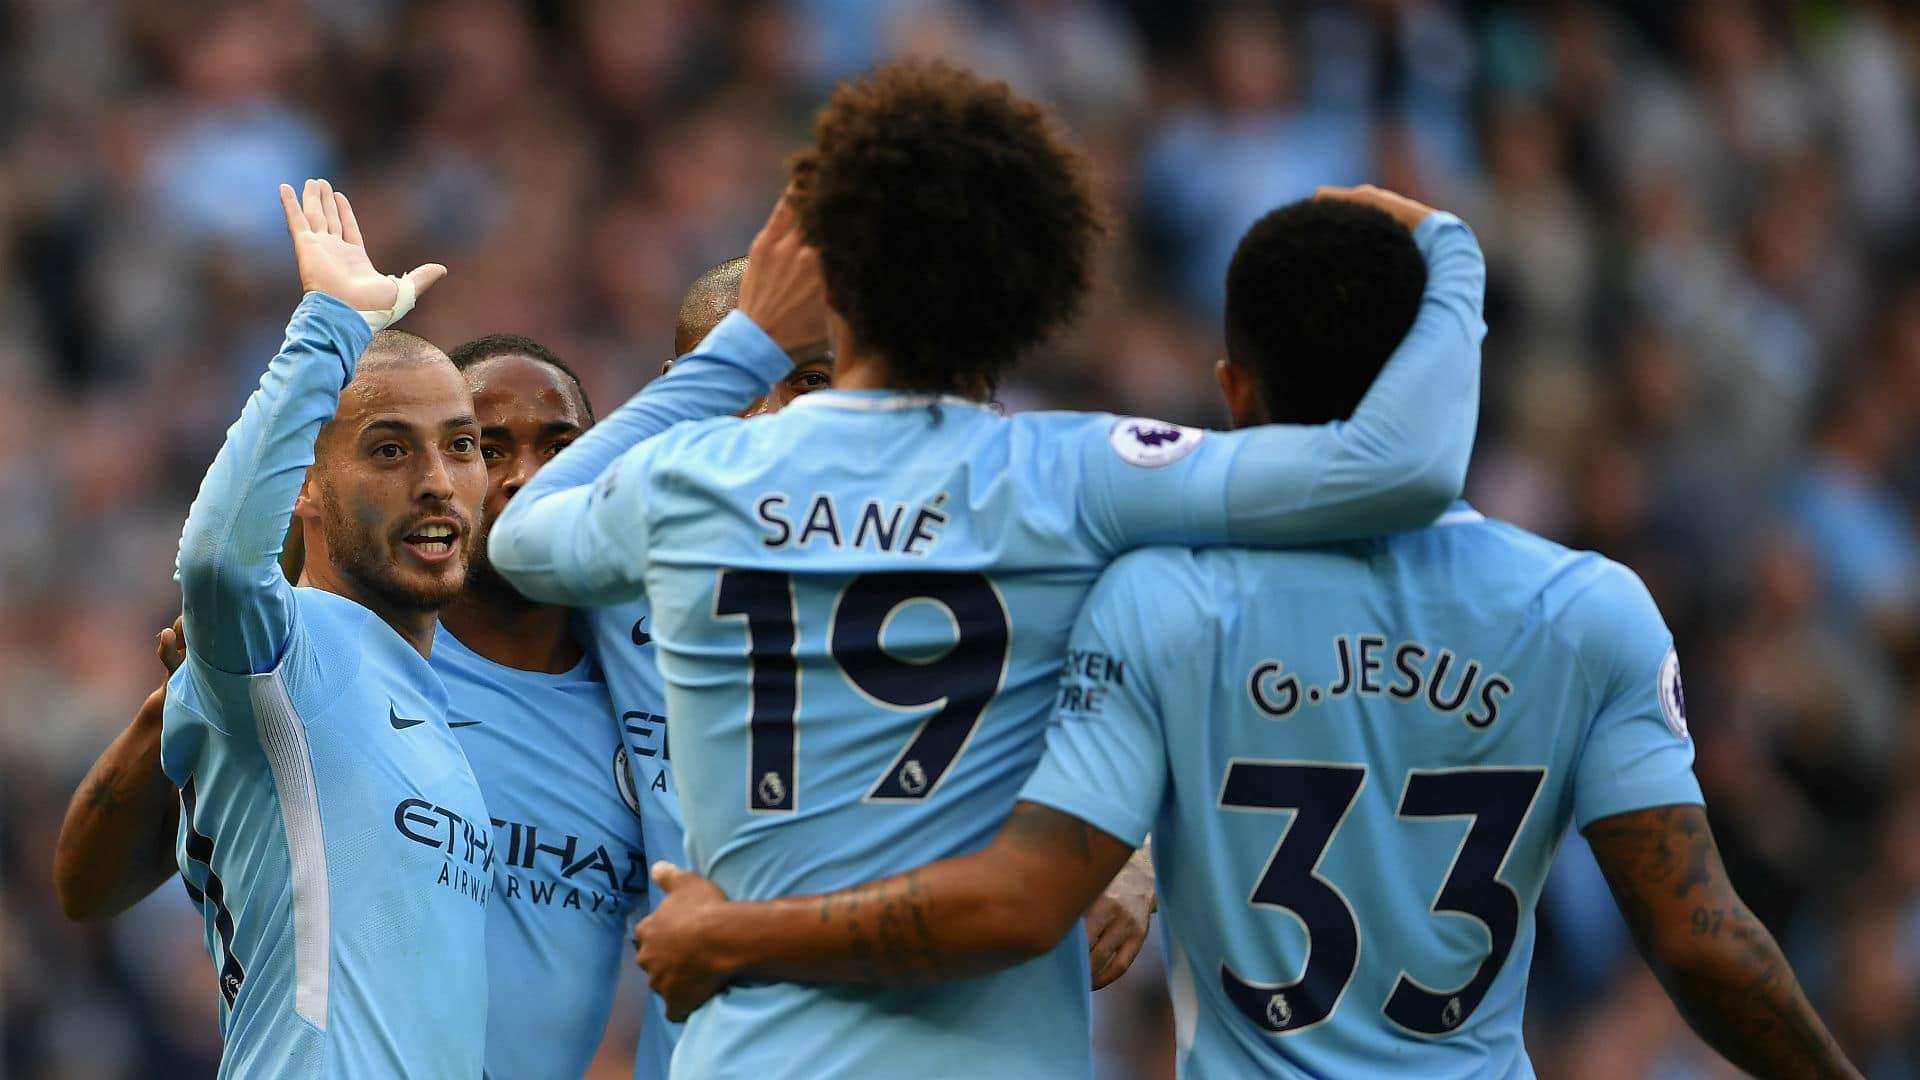 Elenco Do Manchester City Confira Os Jogadores Da Temporada 2020 2021